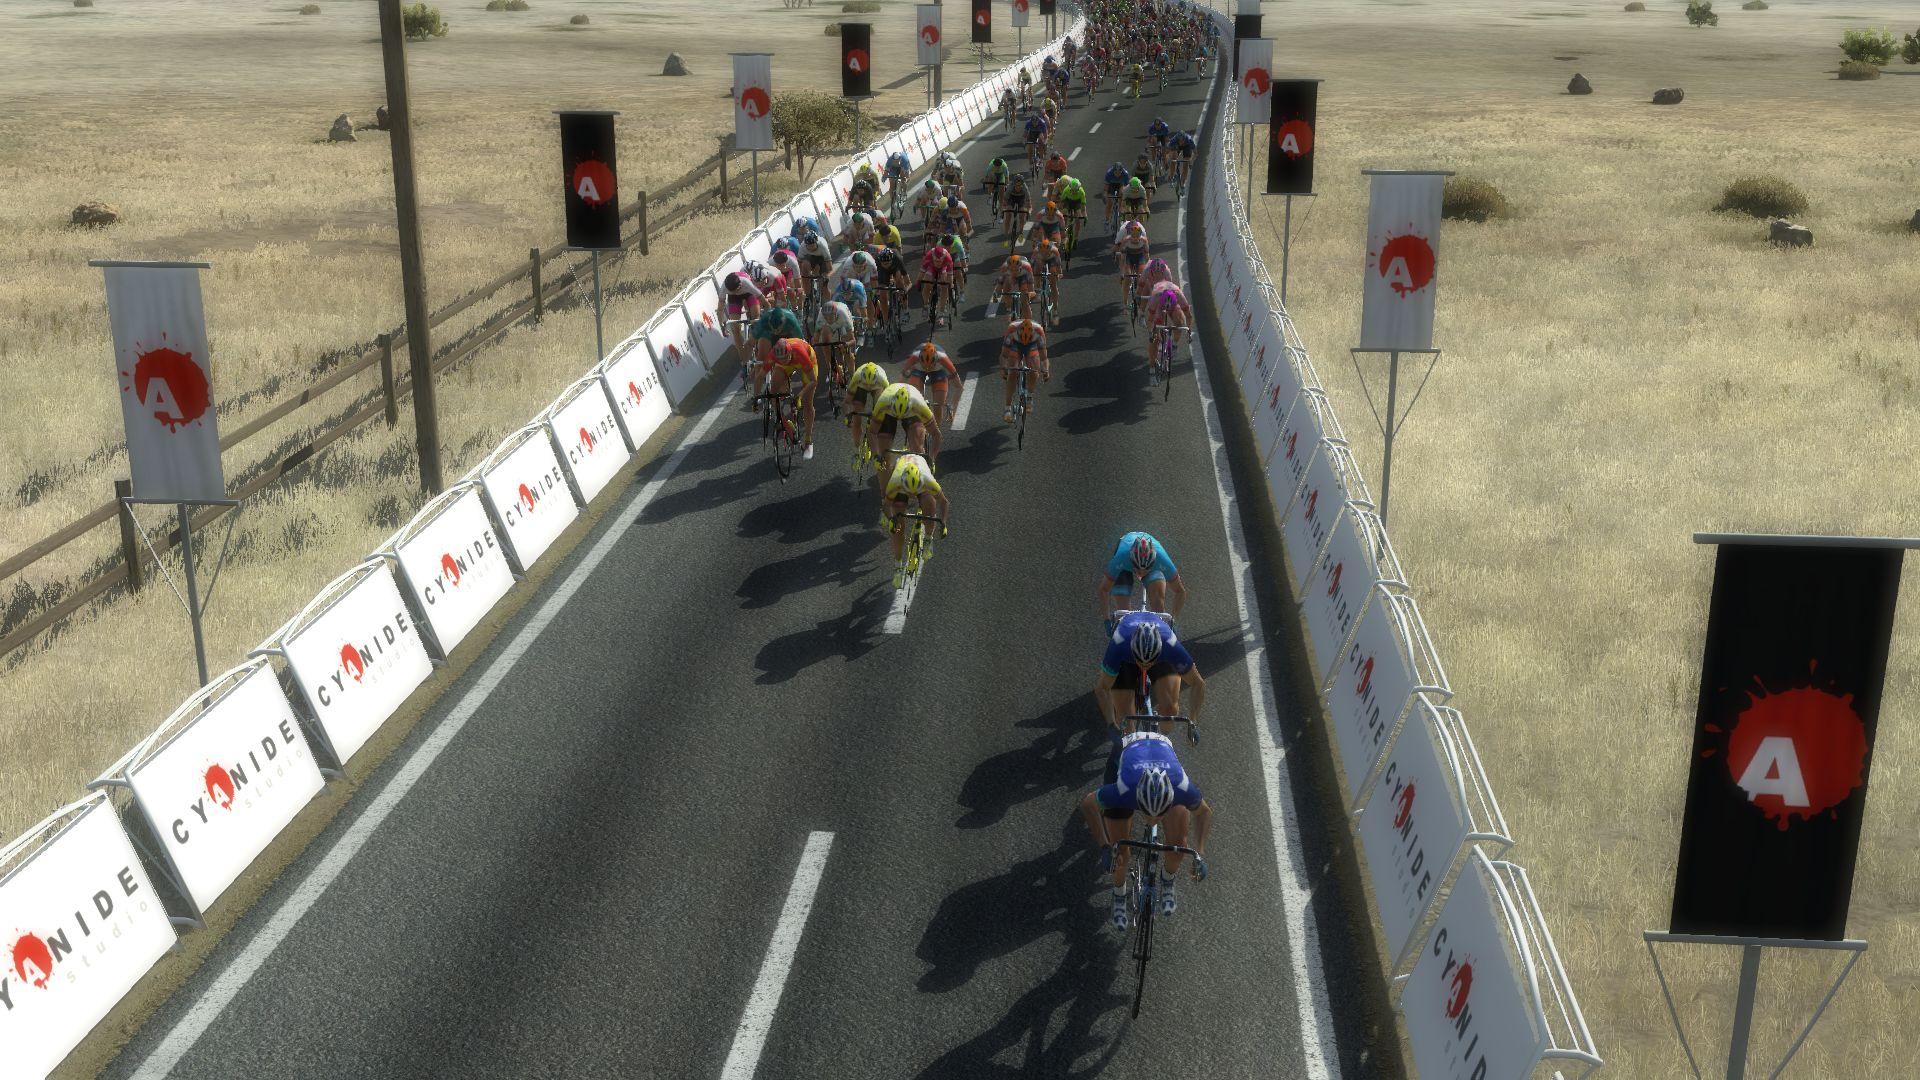 pcmdaily.com/images/mg/2019/Races/PT/Qatar/mg19_qat_s03_12.jpg